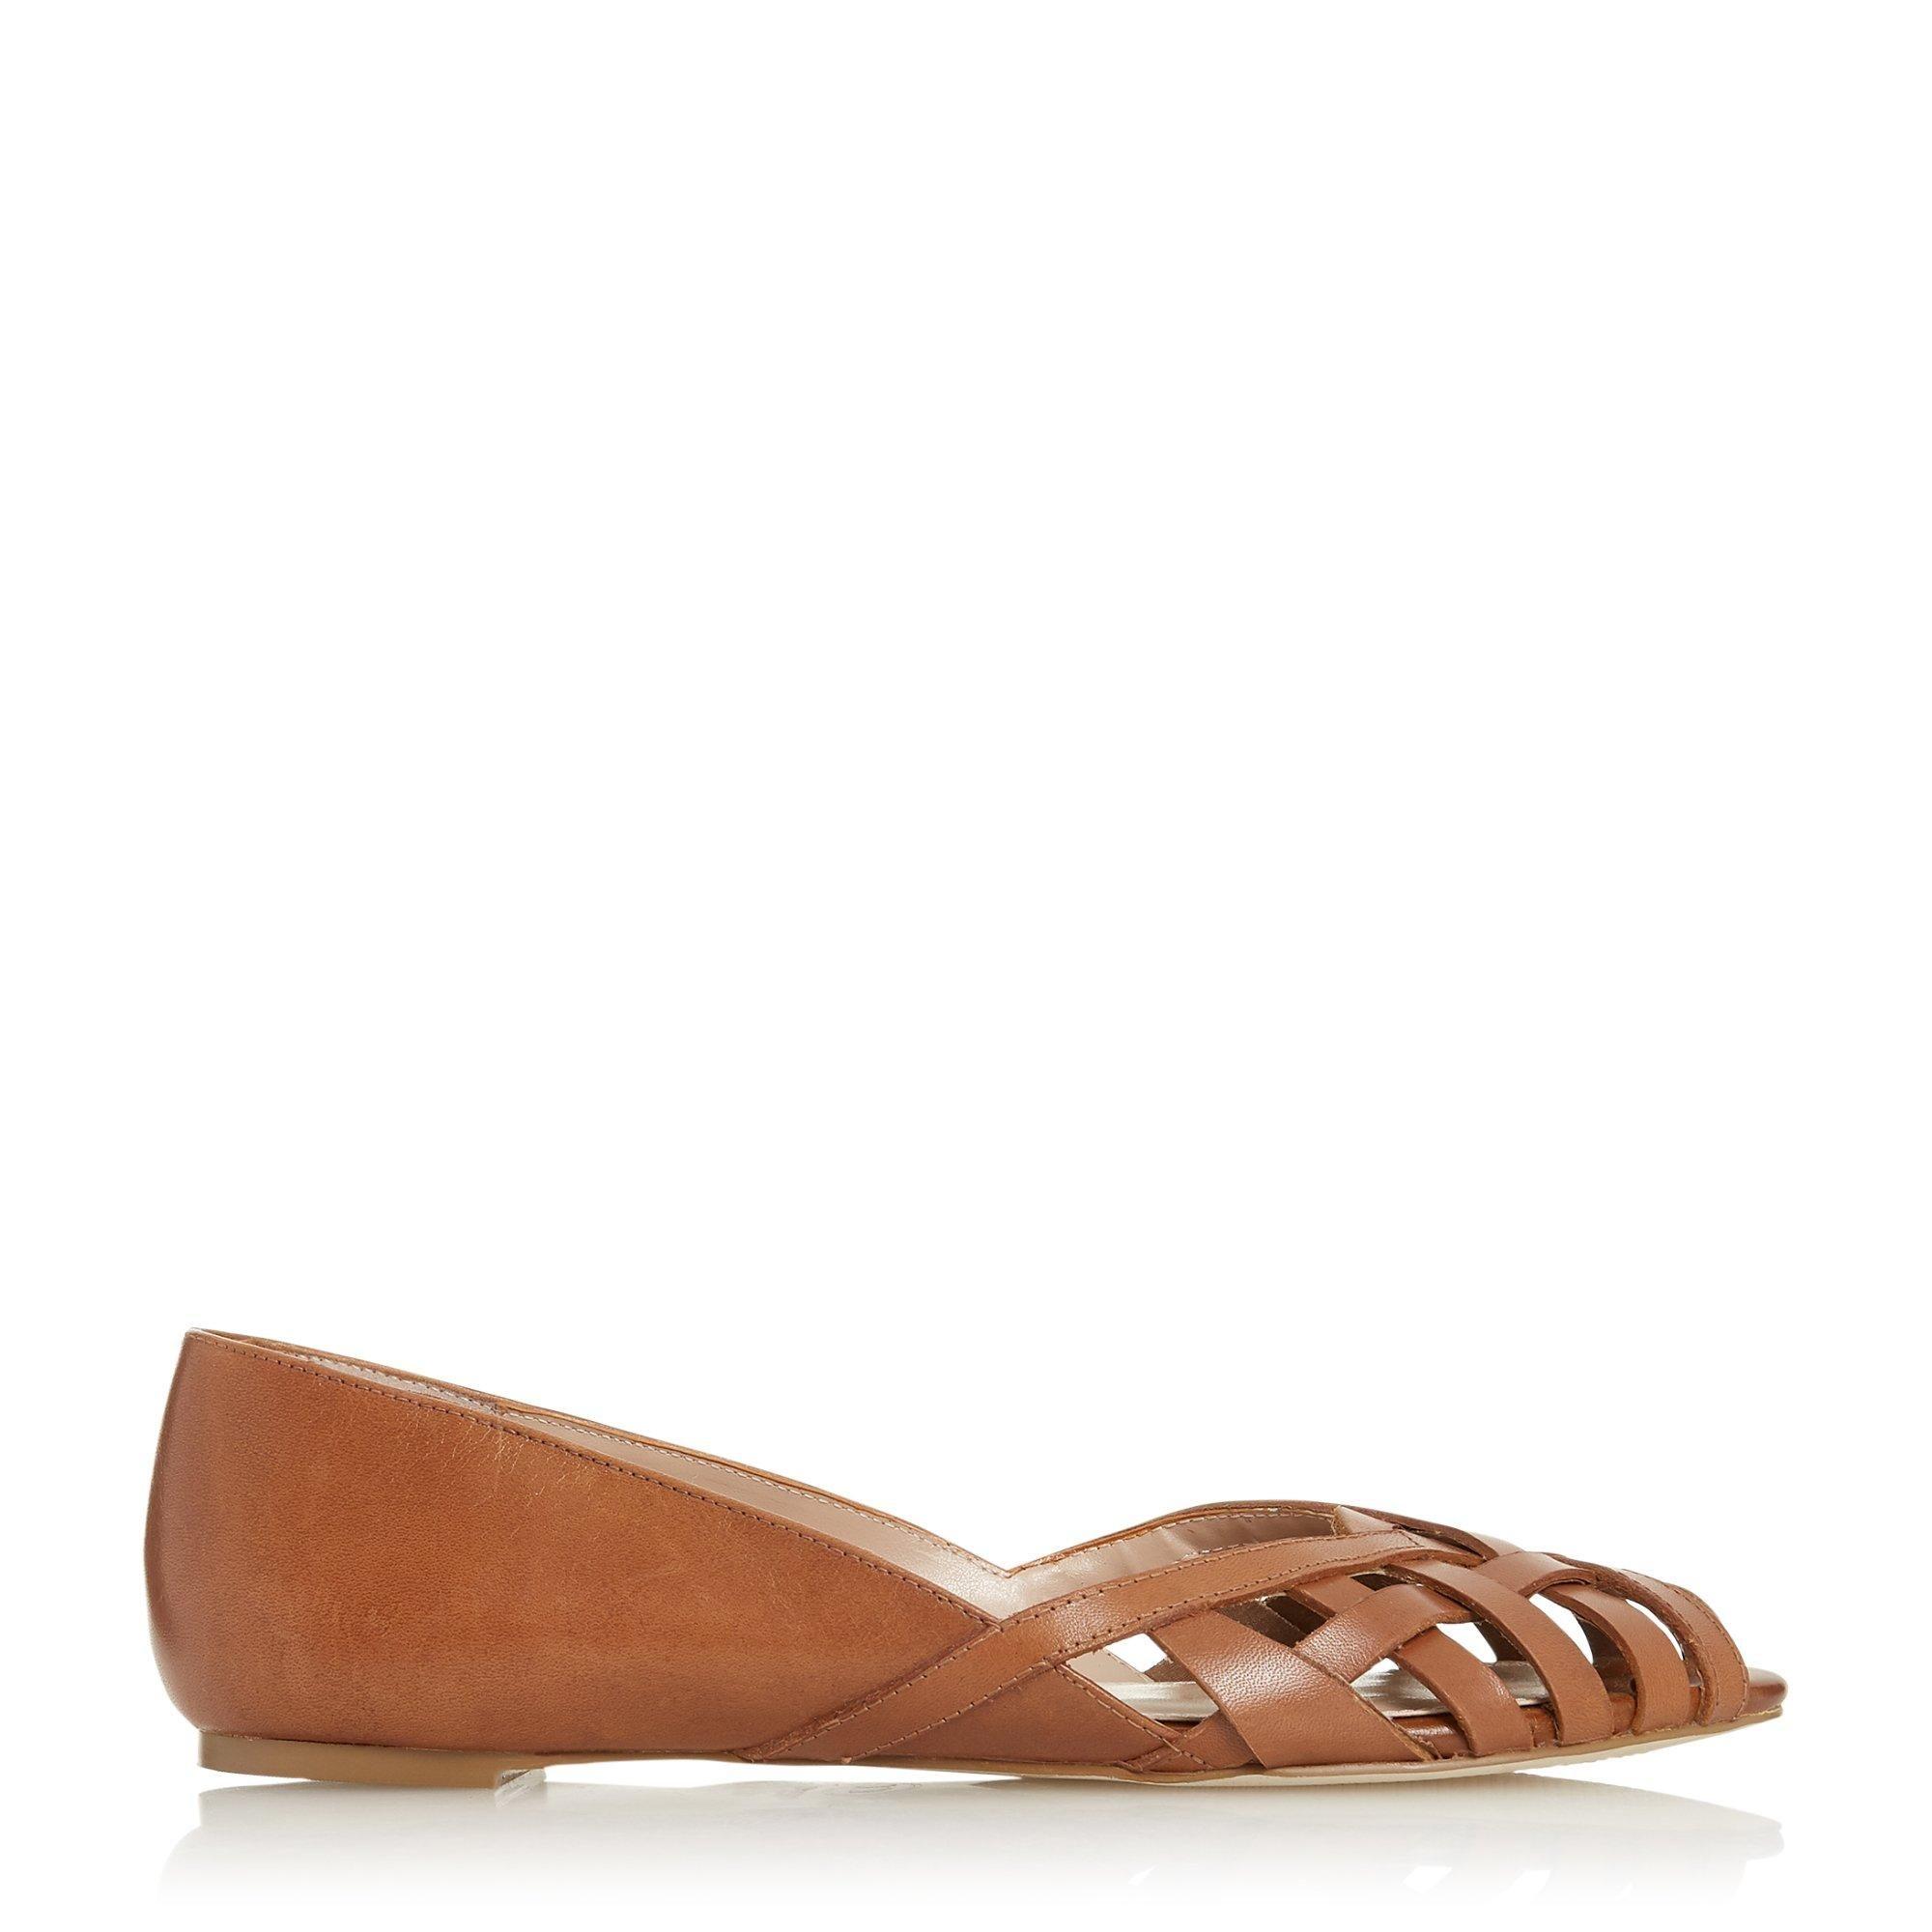 Dune Ladies HARREL Cutwork Peep Toe Ballerina Pump